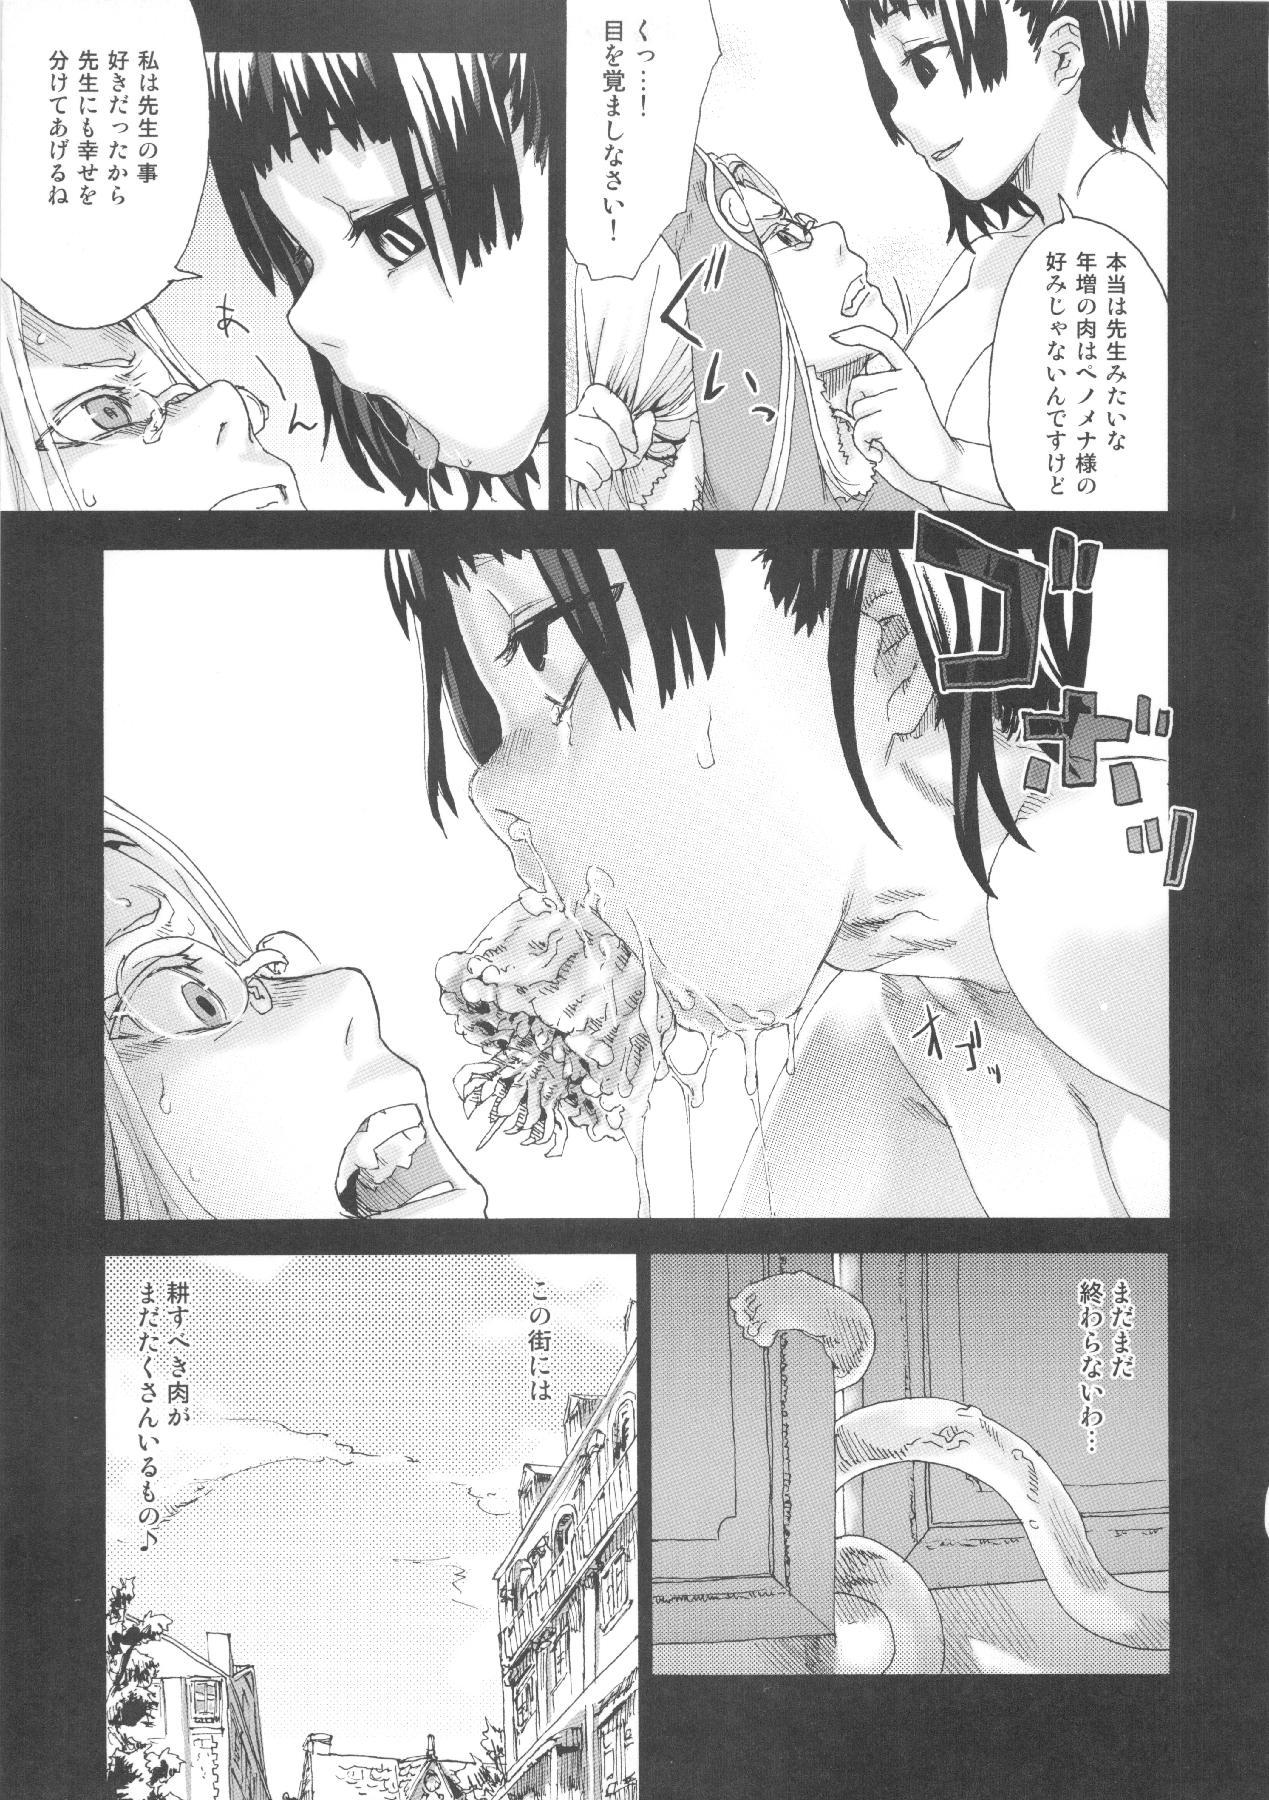 (C83) [Fatalpulse (Asanagi)] VictimGirls Compiled Vol.1 -Victimgirls Soushuuhen 1- MMO Game Selection (Various) 99